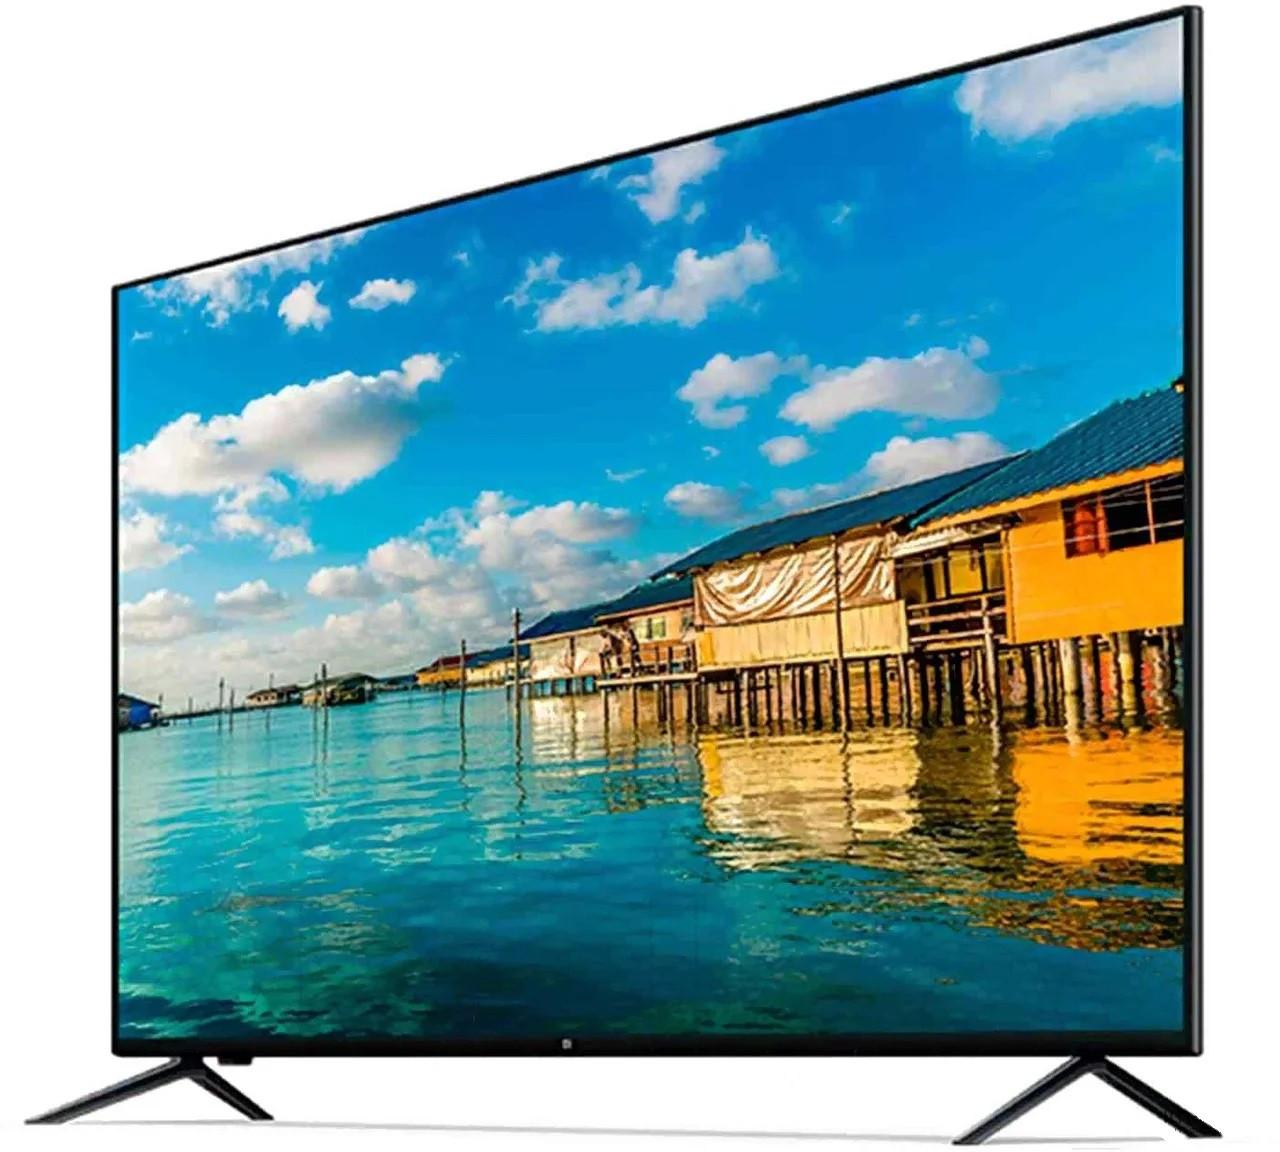 "Телевизор Samsung 50"" SMART TV 2K, DVB-T2 L50 Реплика (LY390D16A180728284W) Wi-Fi, USB HDMI"